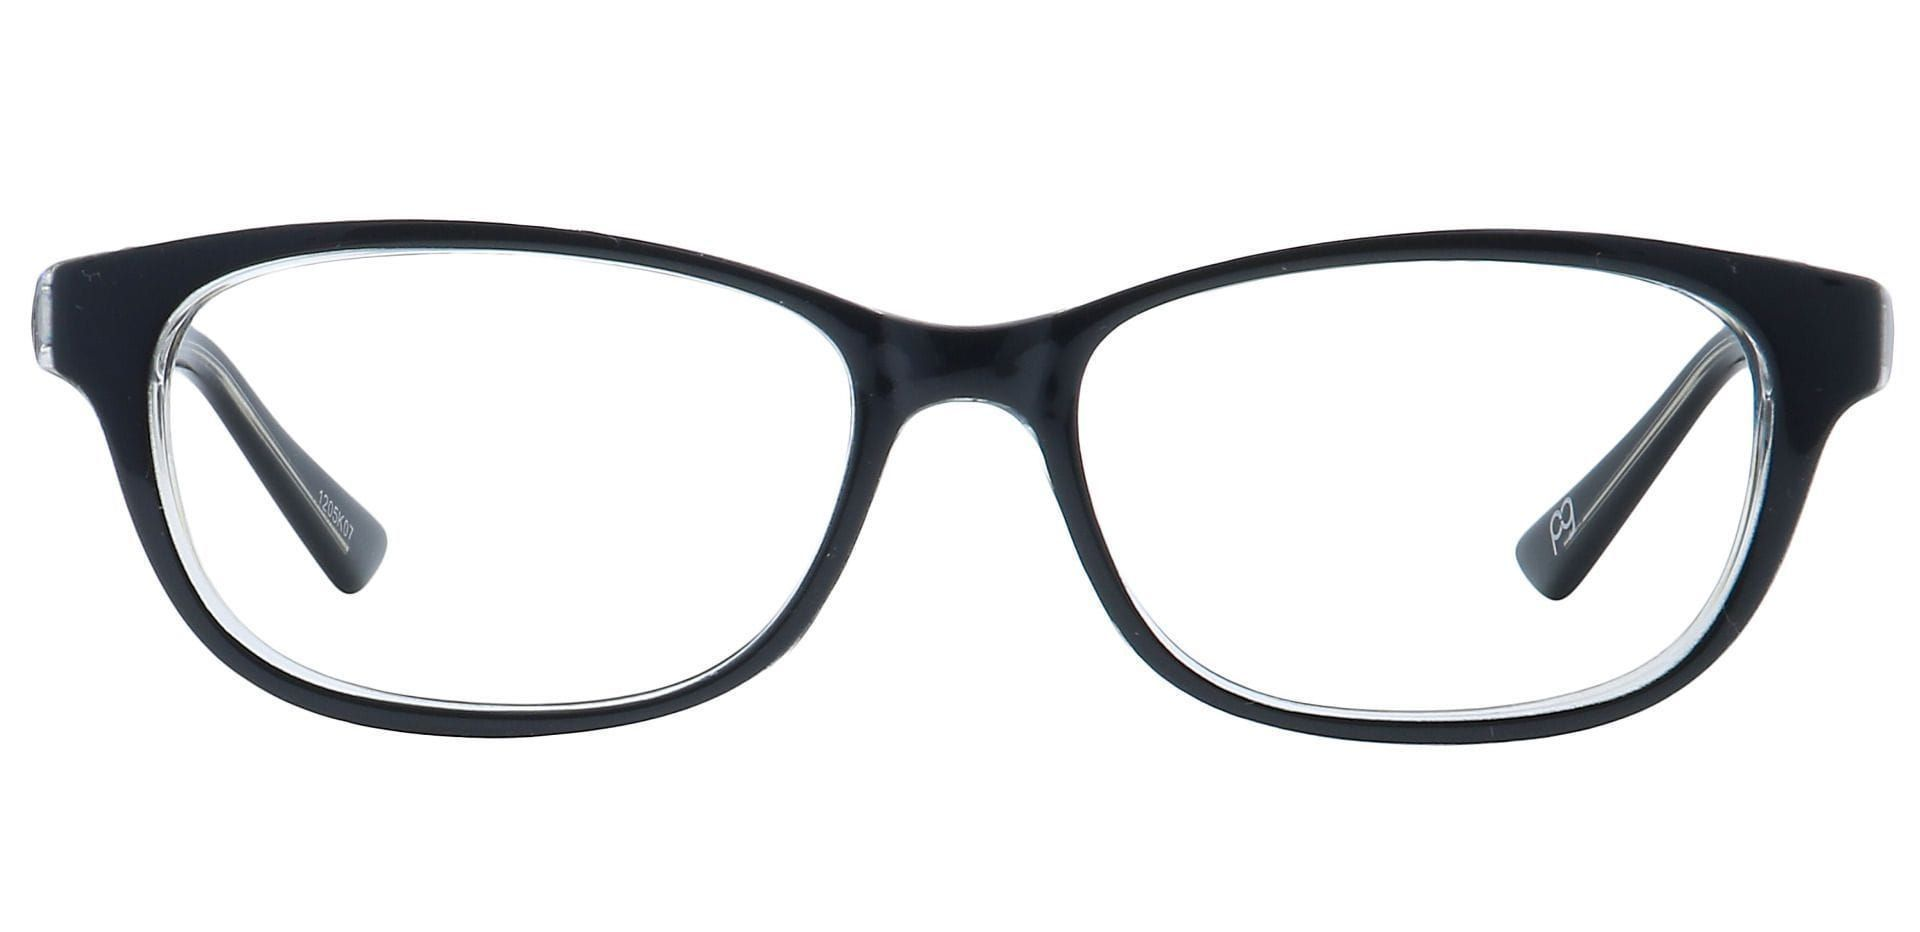 Reyna Classic Square Lined Bifocal Glasses - Black